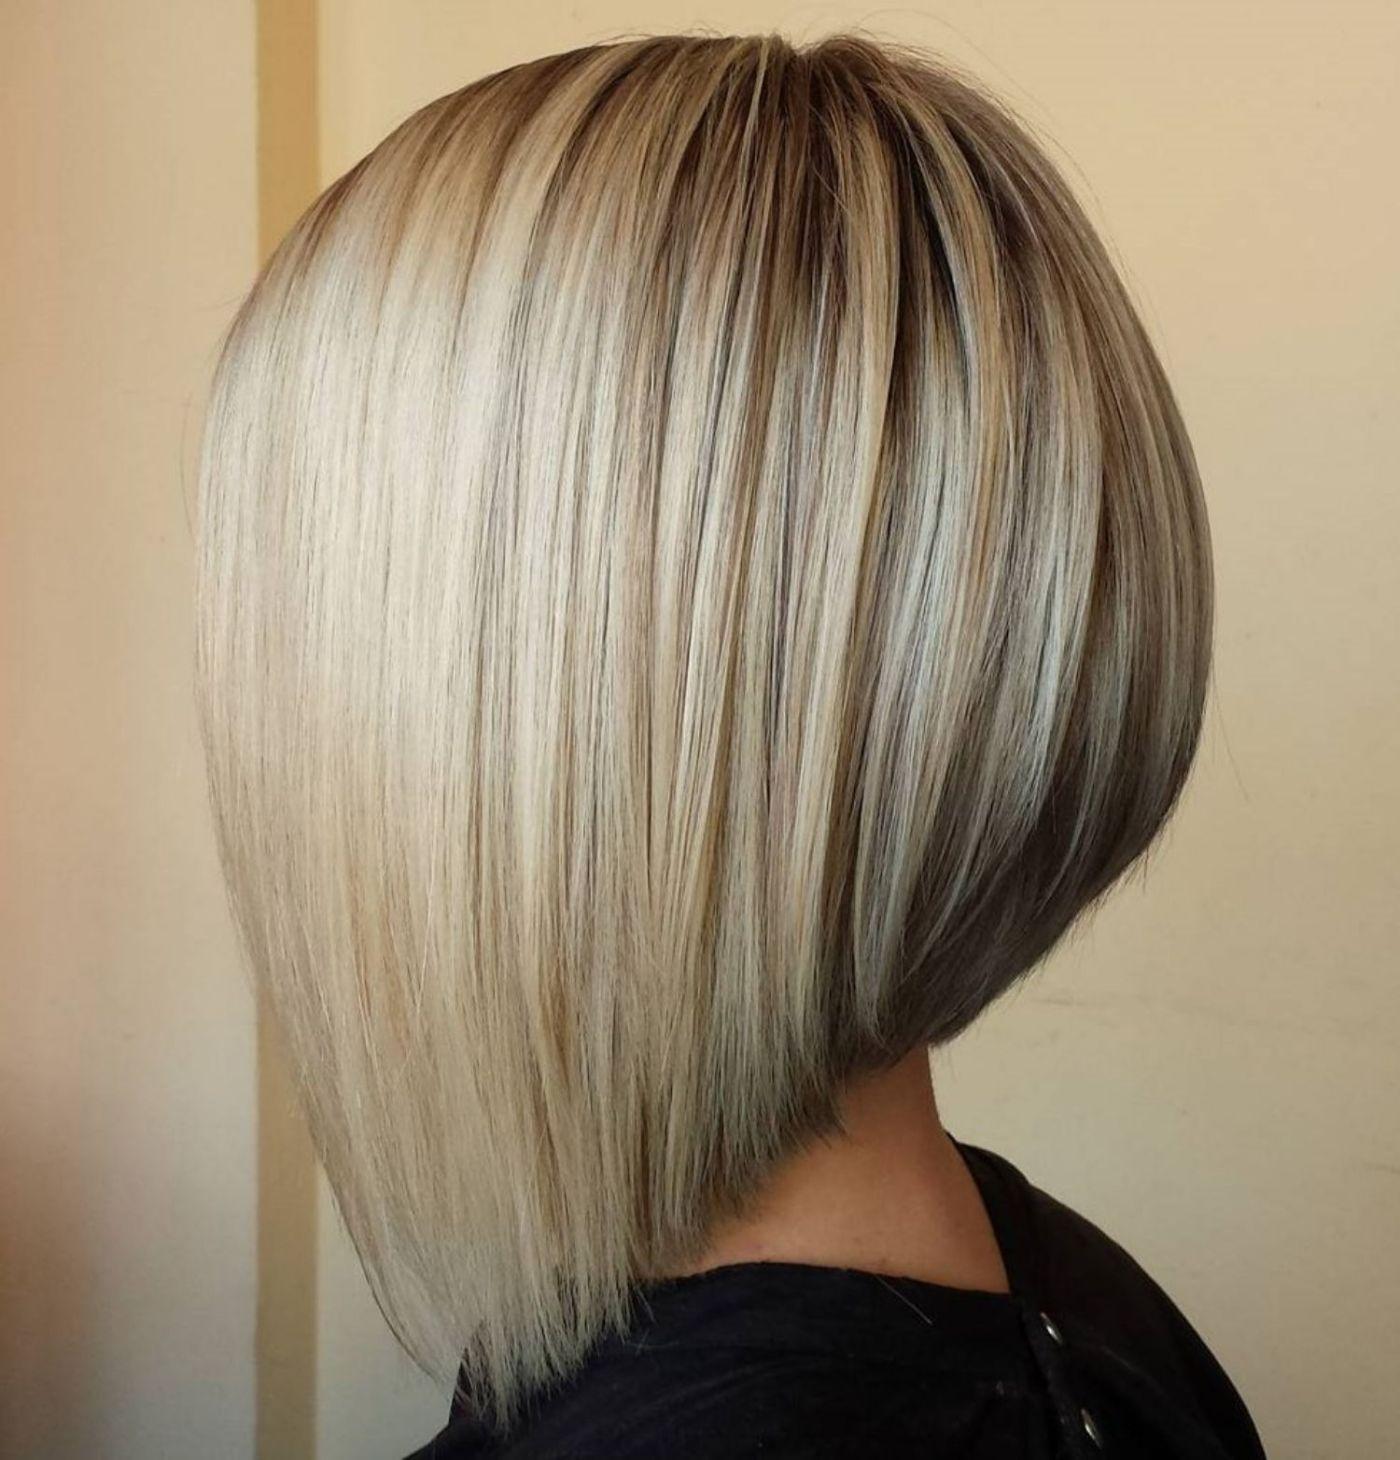 50 Trendy Inverted Bob Haircuts Angled Bob Hairstyles Inverted Bob Haircuts Angled Bob Haircuts